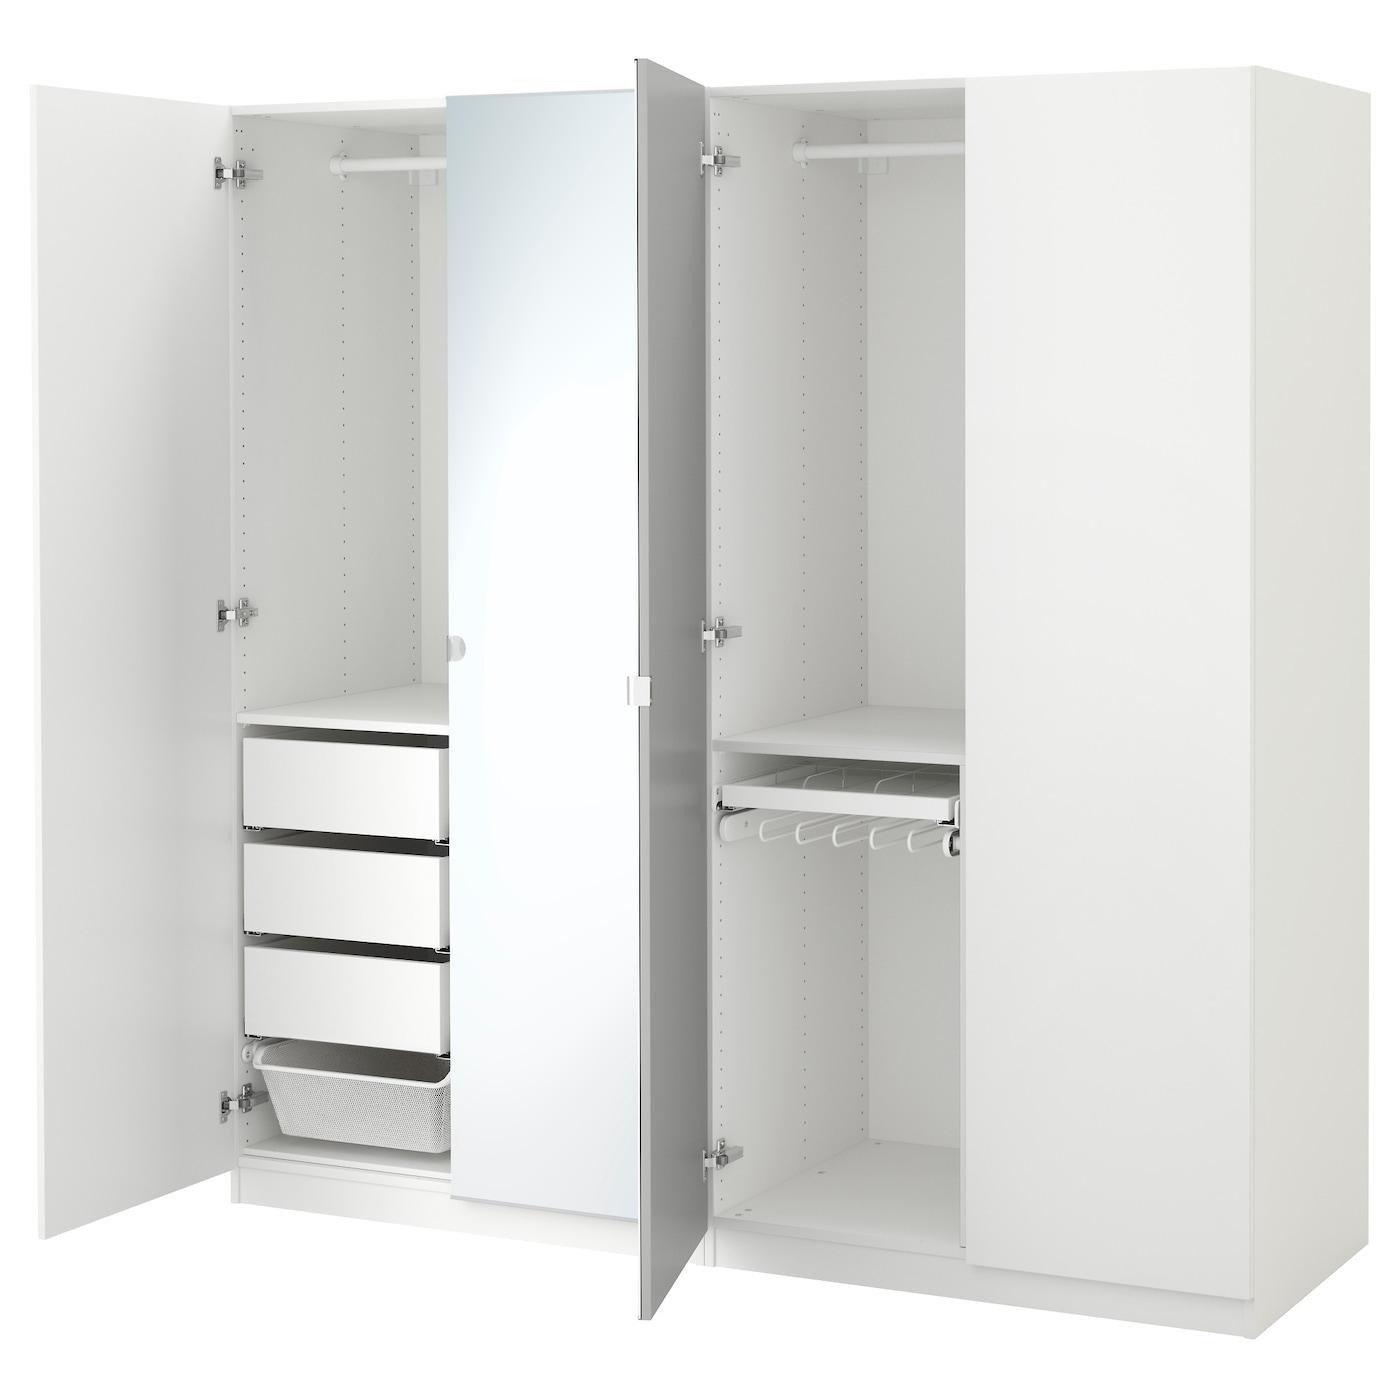 pax wardrobe white forsand vikedal 200x60x201 cm ikea. Black Bedroom Furniture Sets. Home Design Ideas